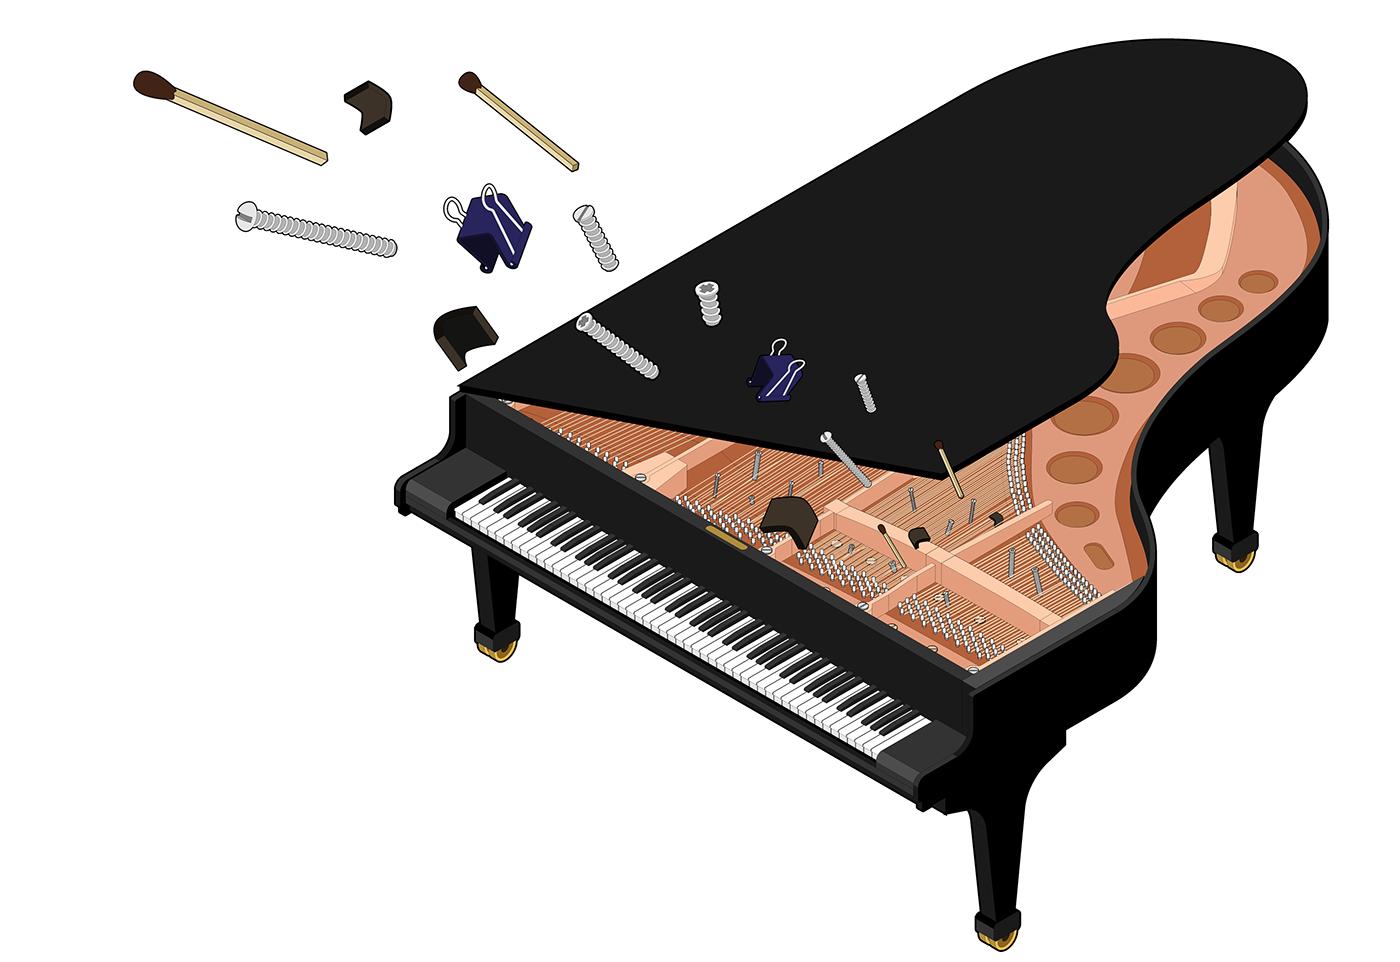 Image may contain: piano, musical keyboard and music